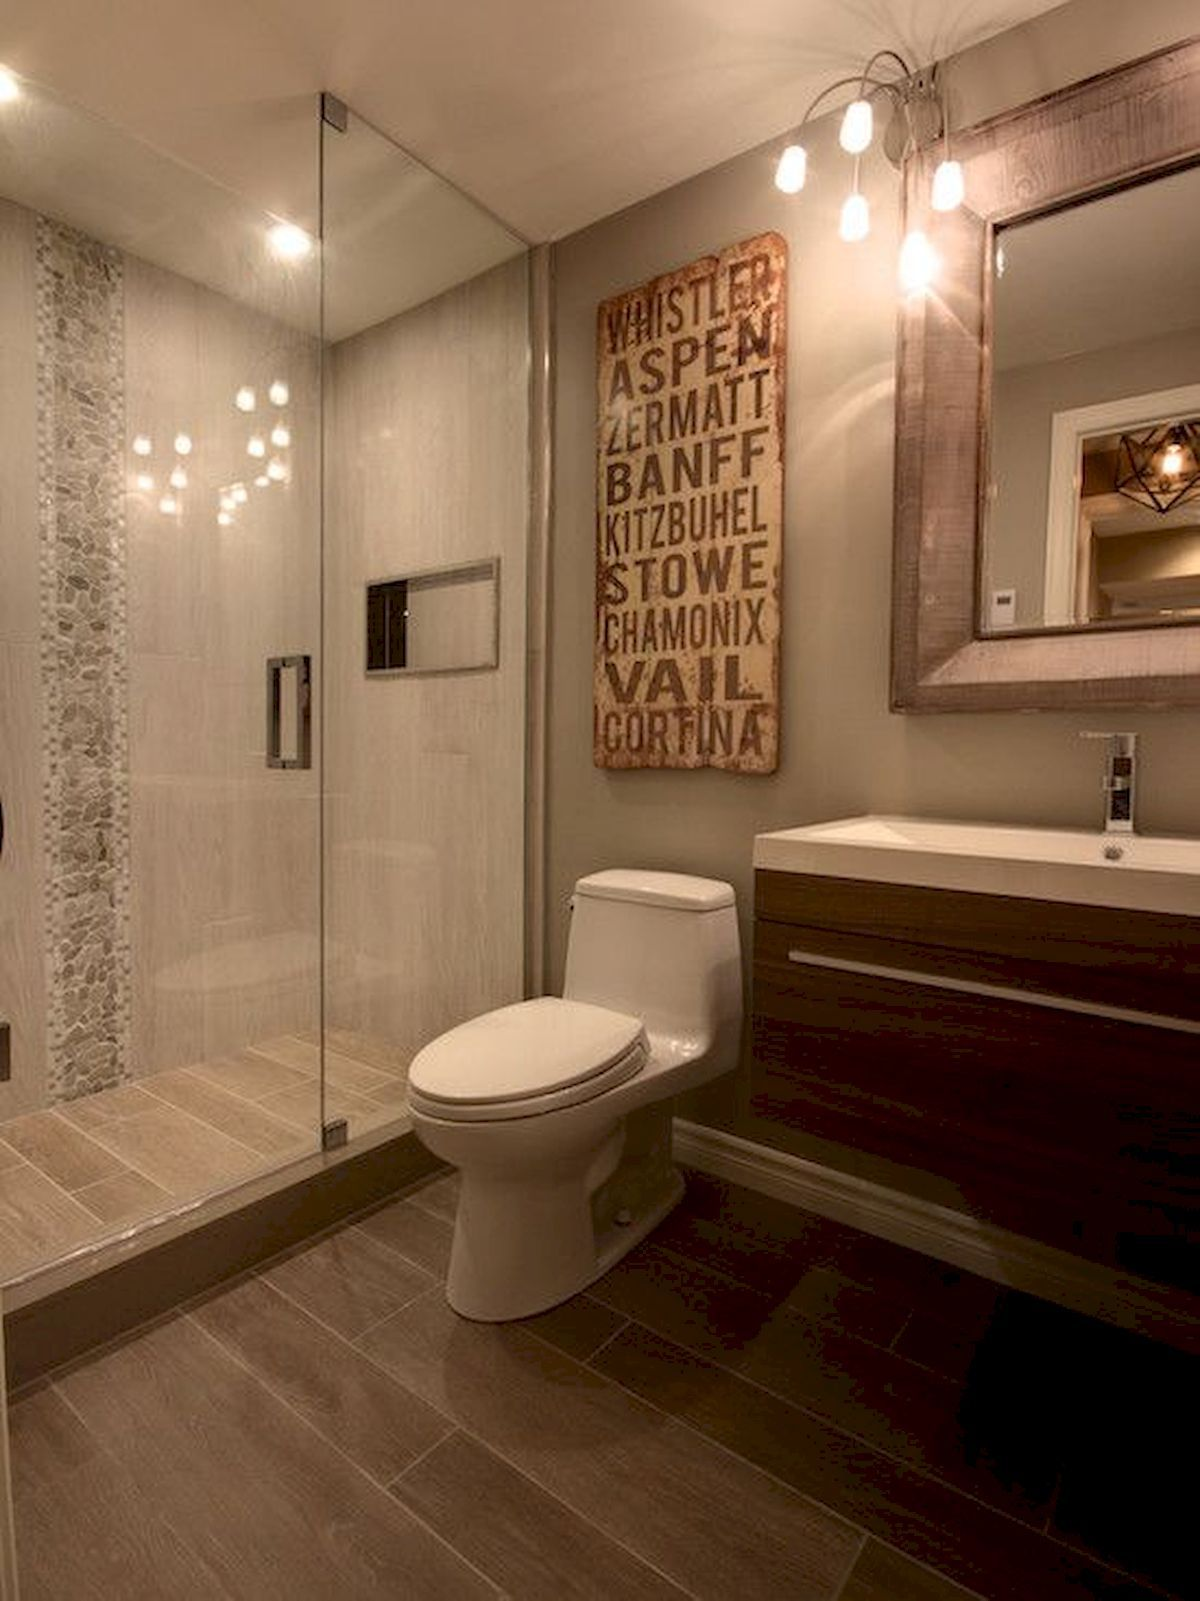 Pin by David San Jose Jr on Bathroom in 2020 Bathroom